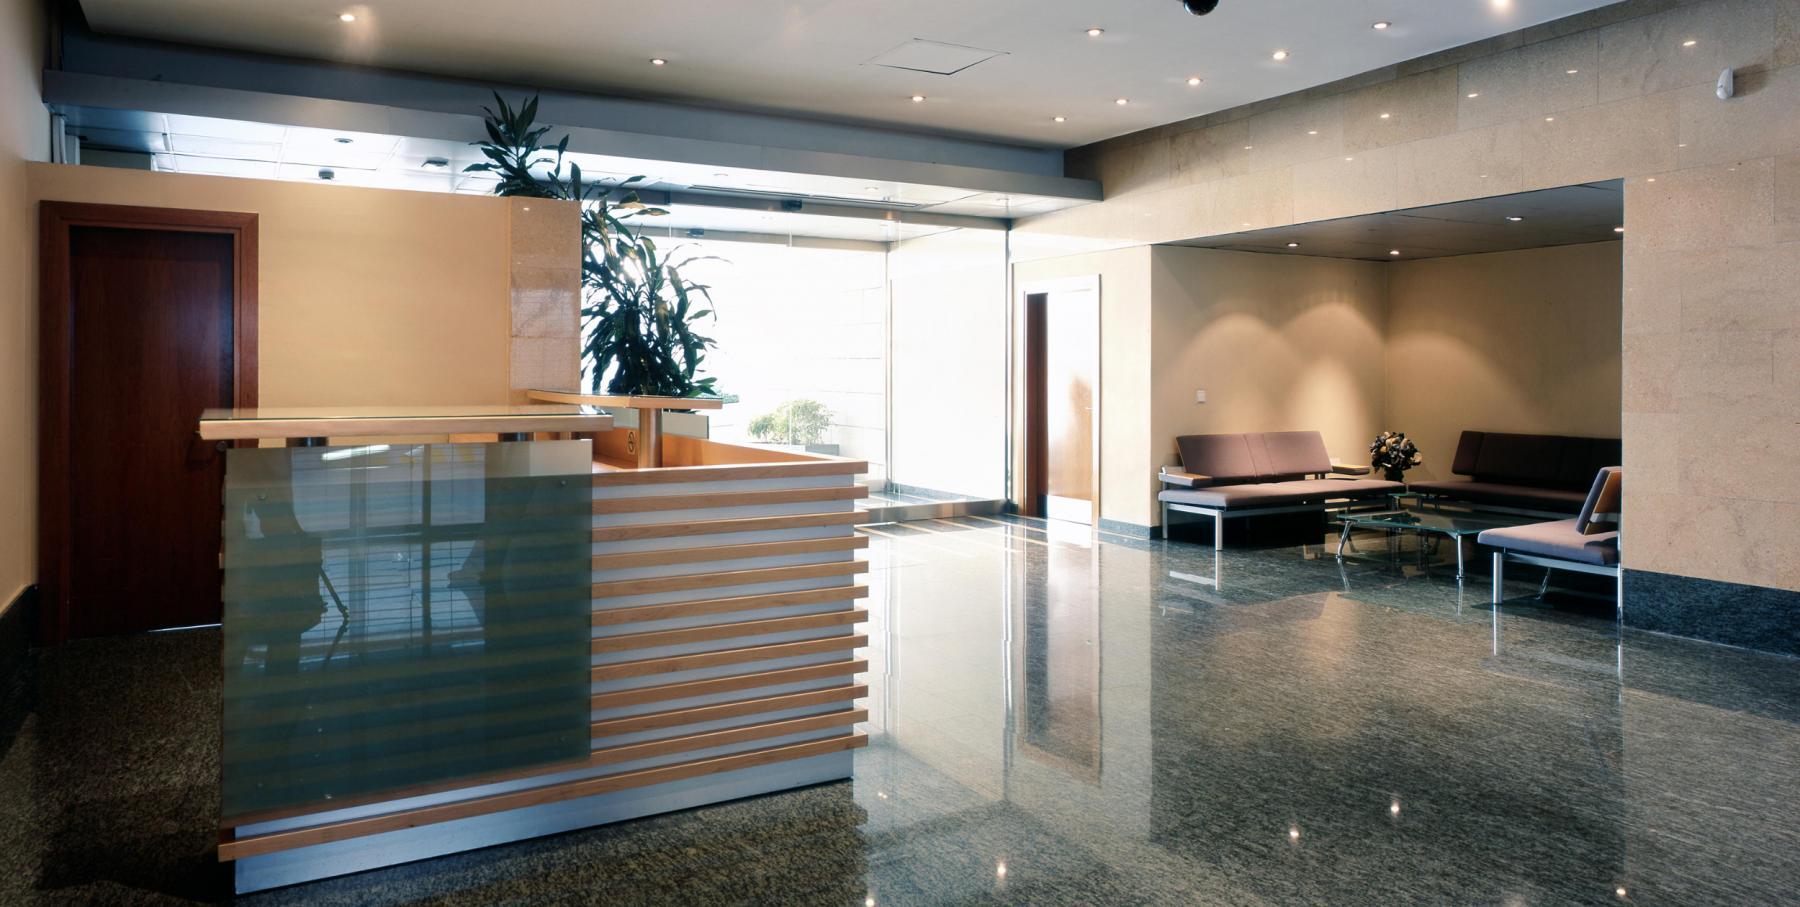 Alquilar oficinas Calle de Serrano Galvache 33, Madrid (4)